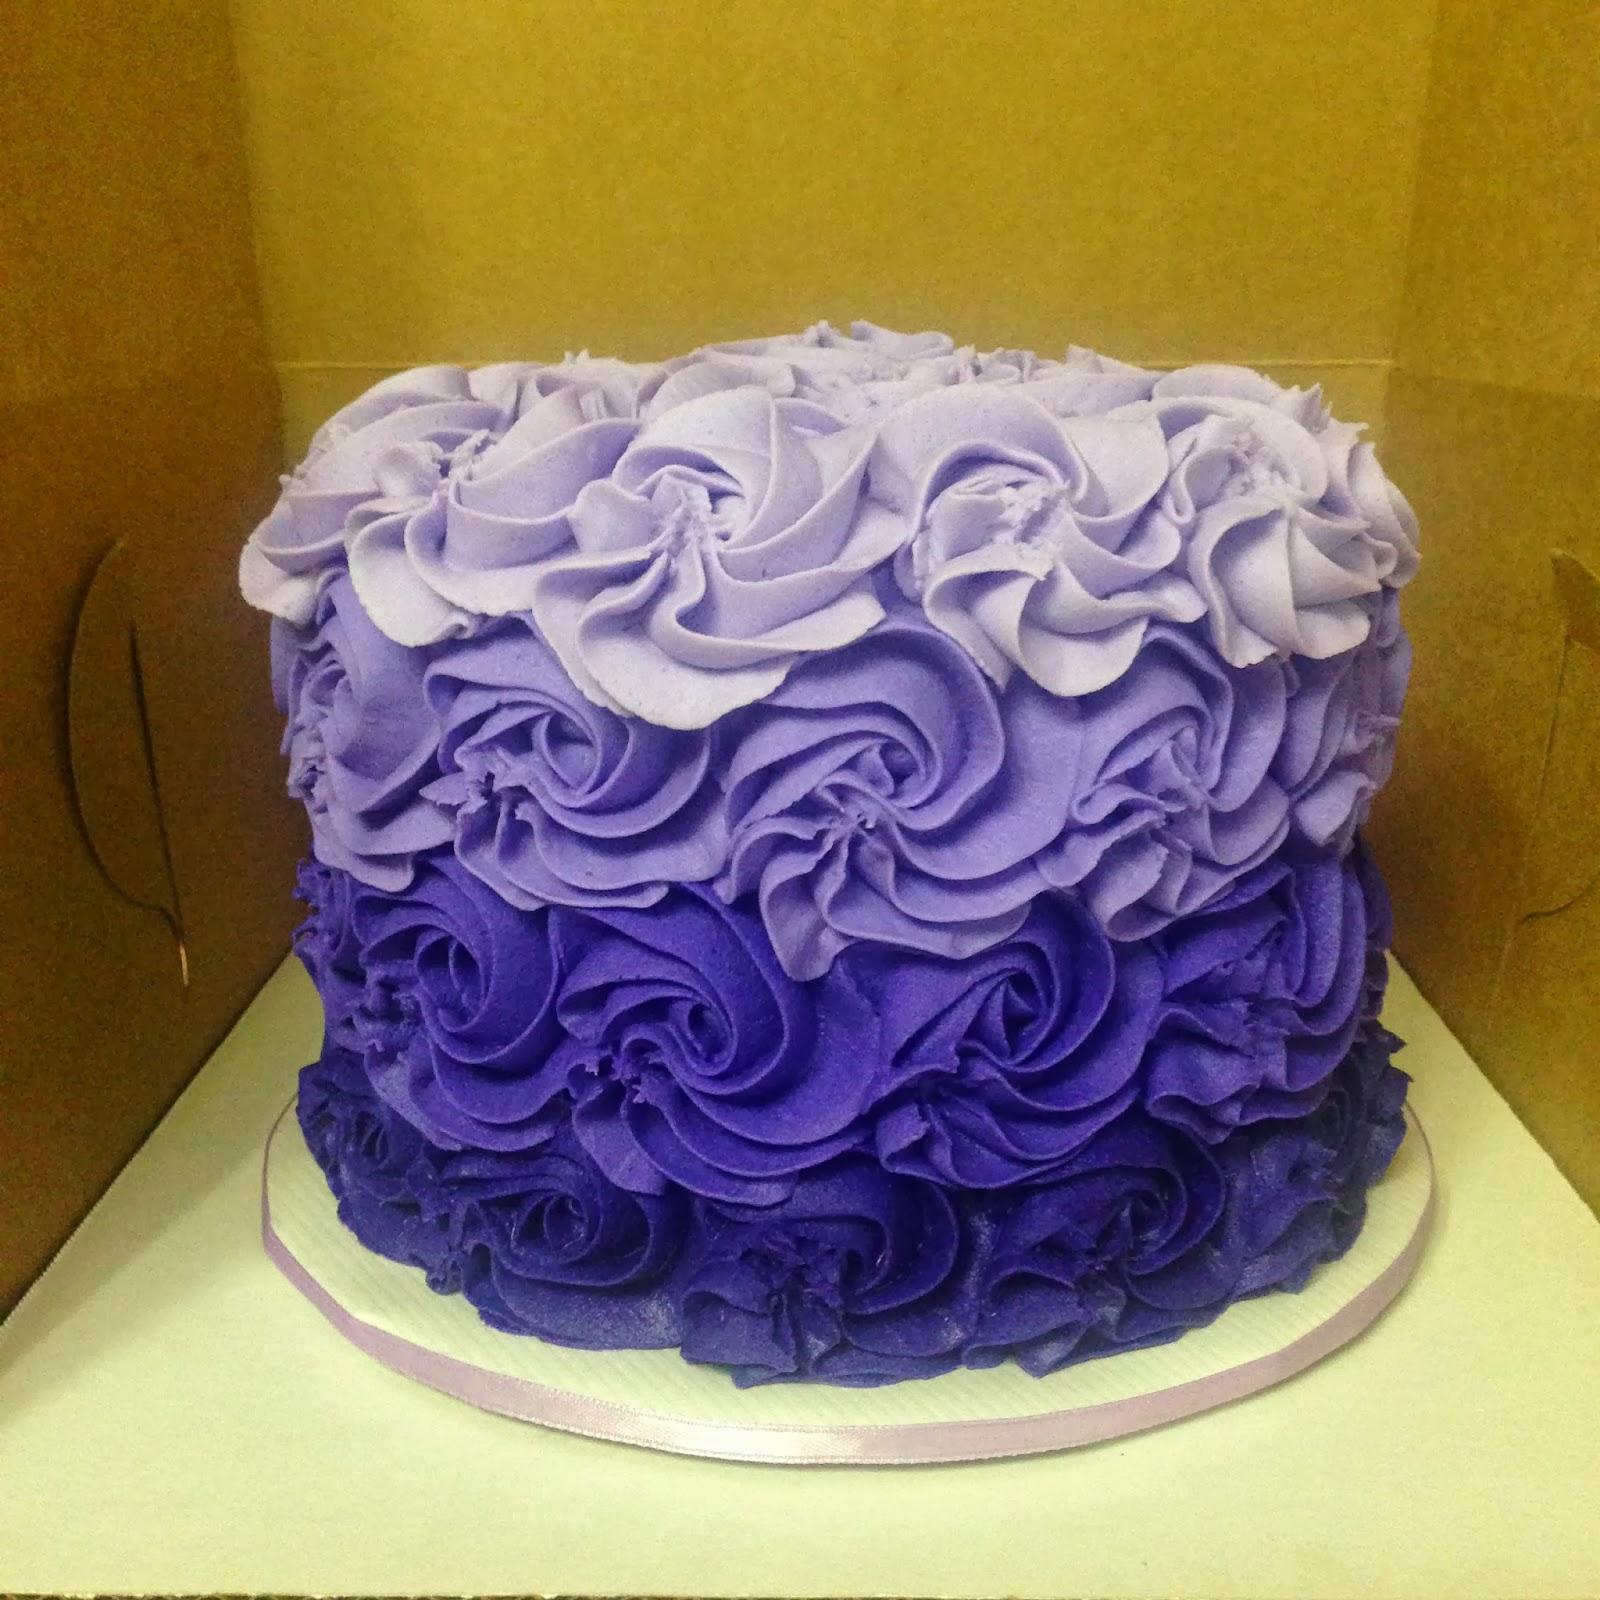 Rosette Cake Design : Cakes by Mindy: Purple Rosette Cake 6